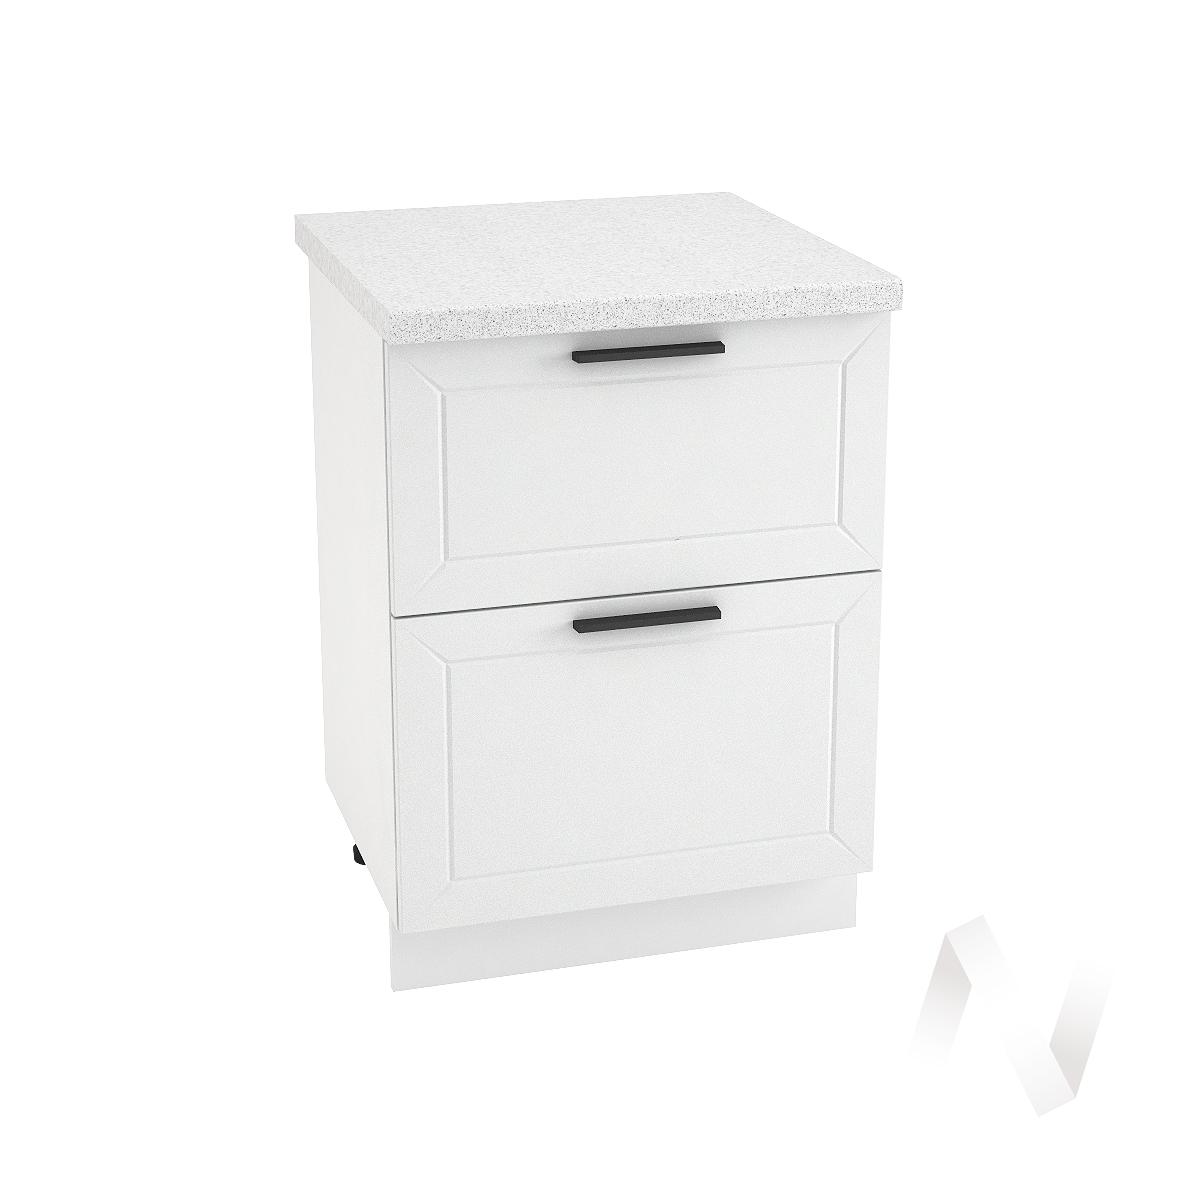 "Кухня ""Глетчер"": Шкаф нижний с 2-мя ящиками 600, ШН2Я 600 (Айленд Силк/корпус белый)"